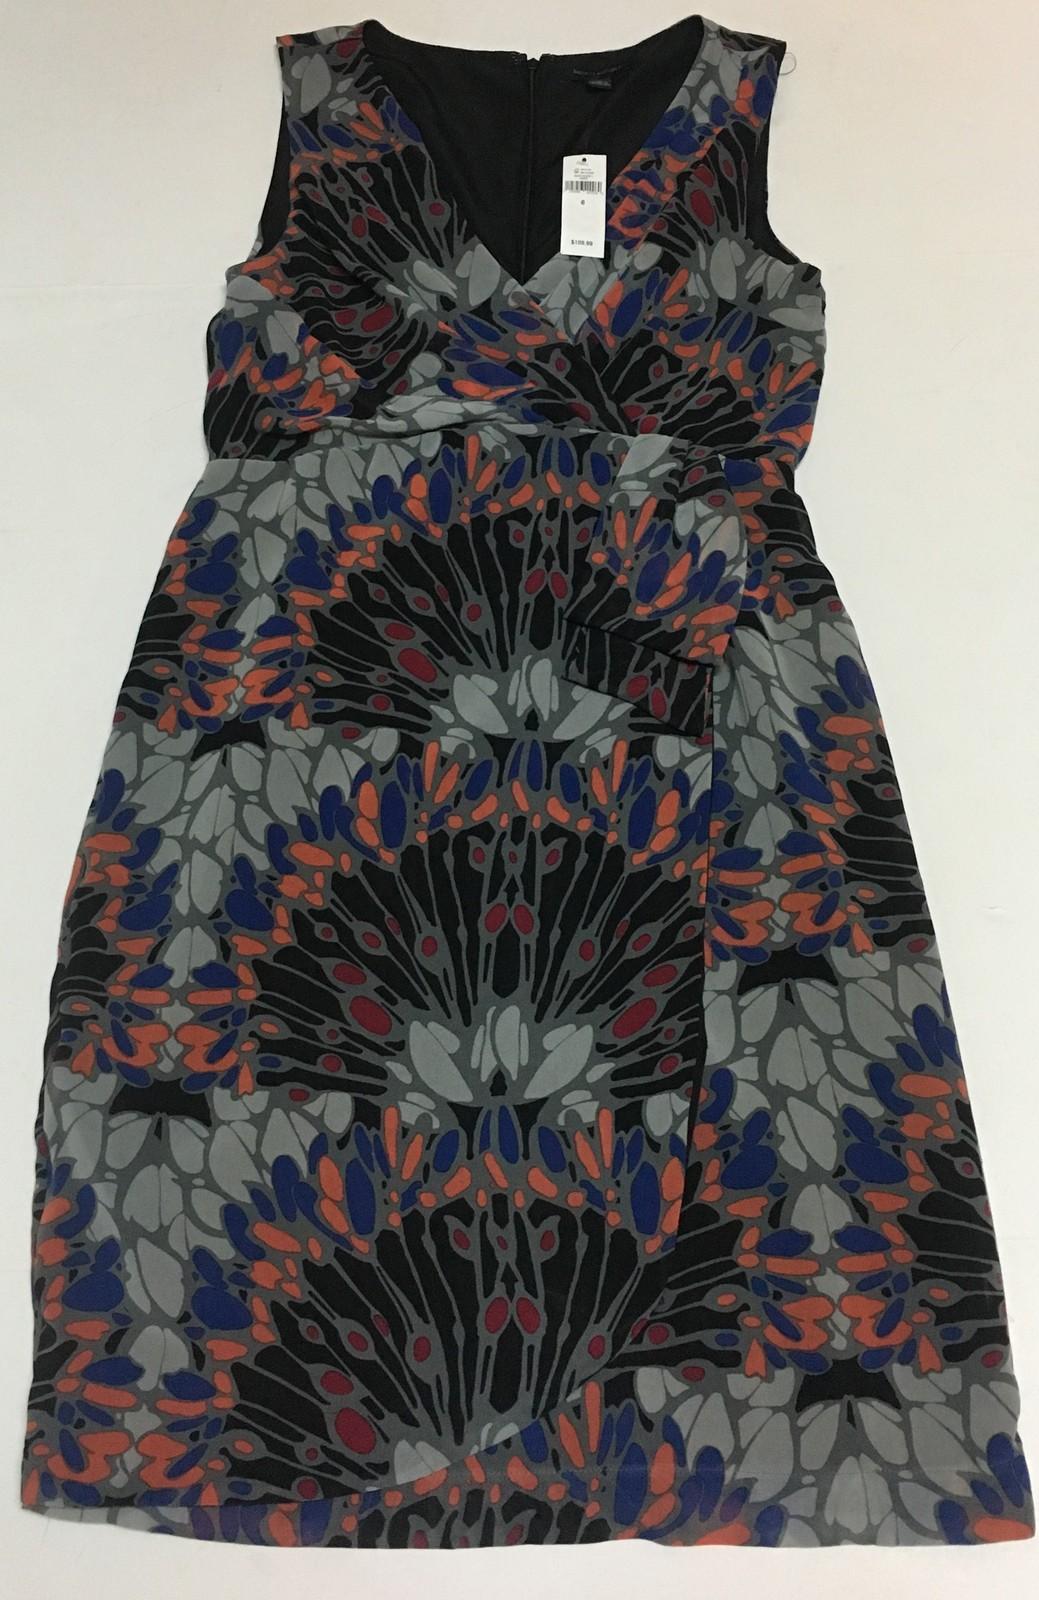 Banana Republic Summer Dress Multi-Color Coral Blue Black Sz 6 NWT